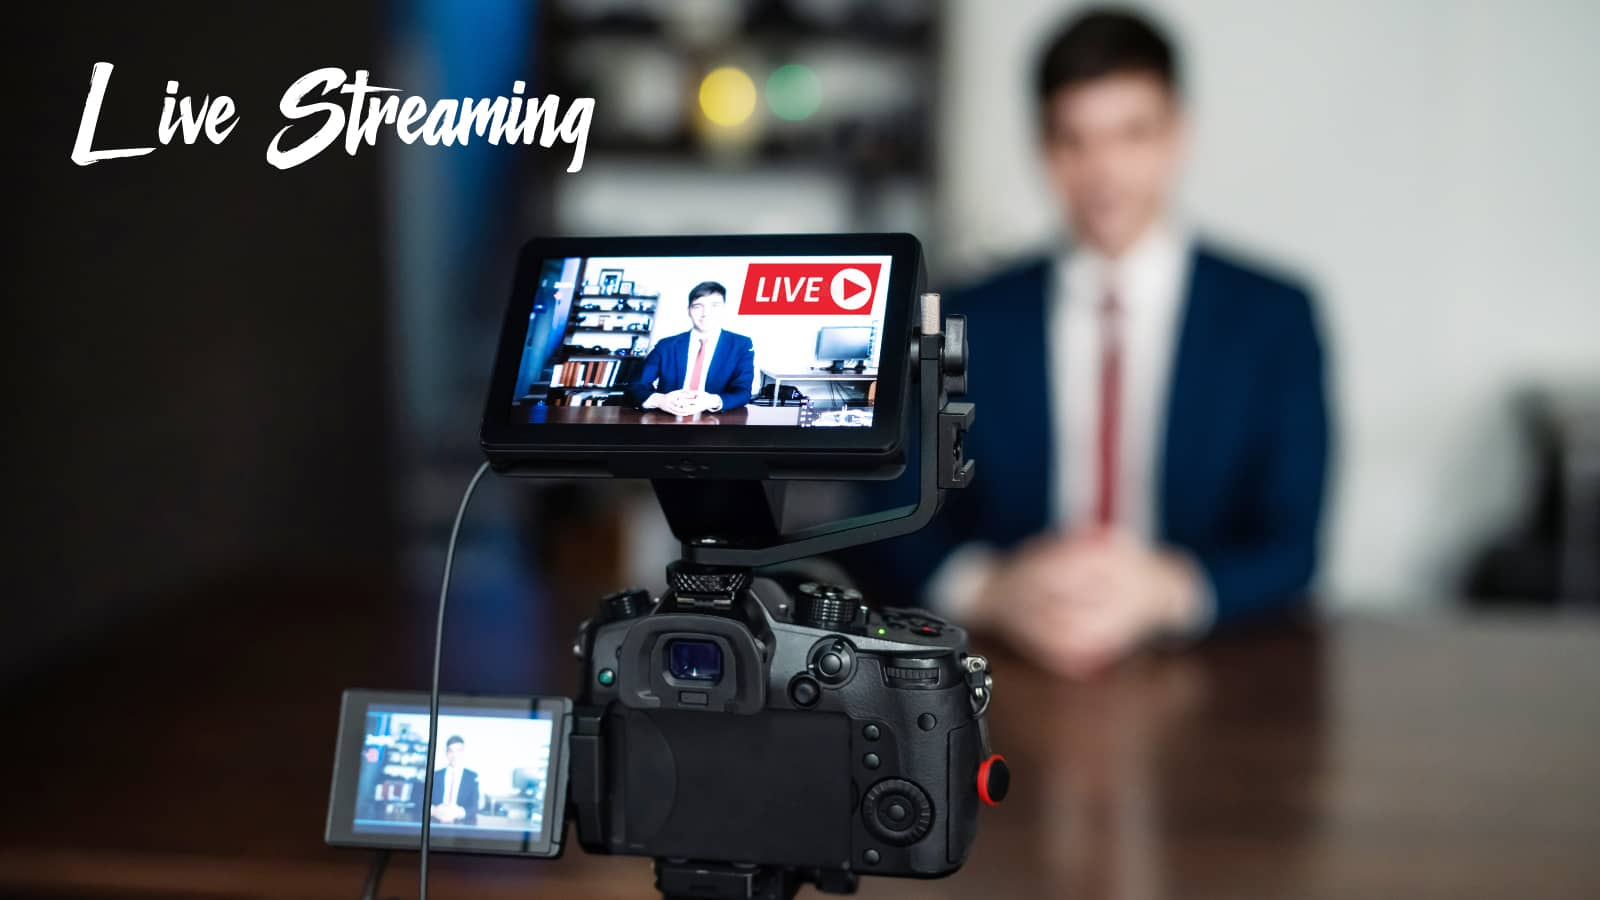 BtoB企業向けライブ動画配信代行サービス「LiB リブ」